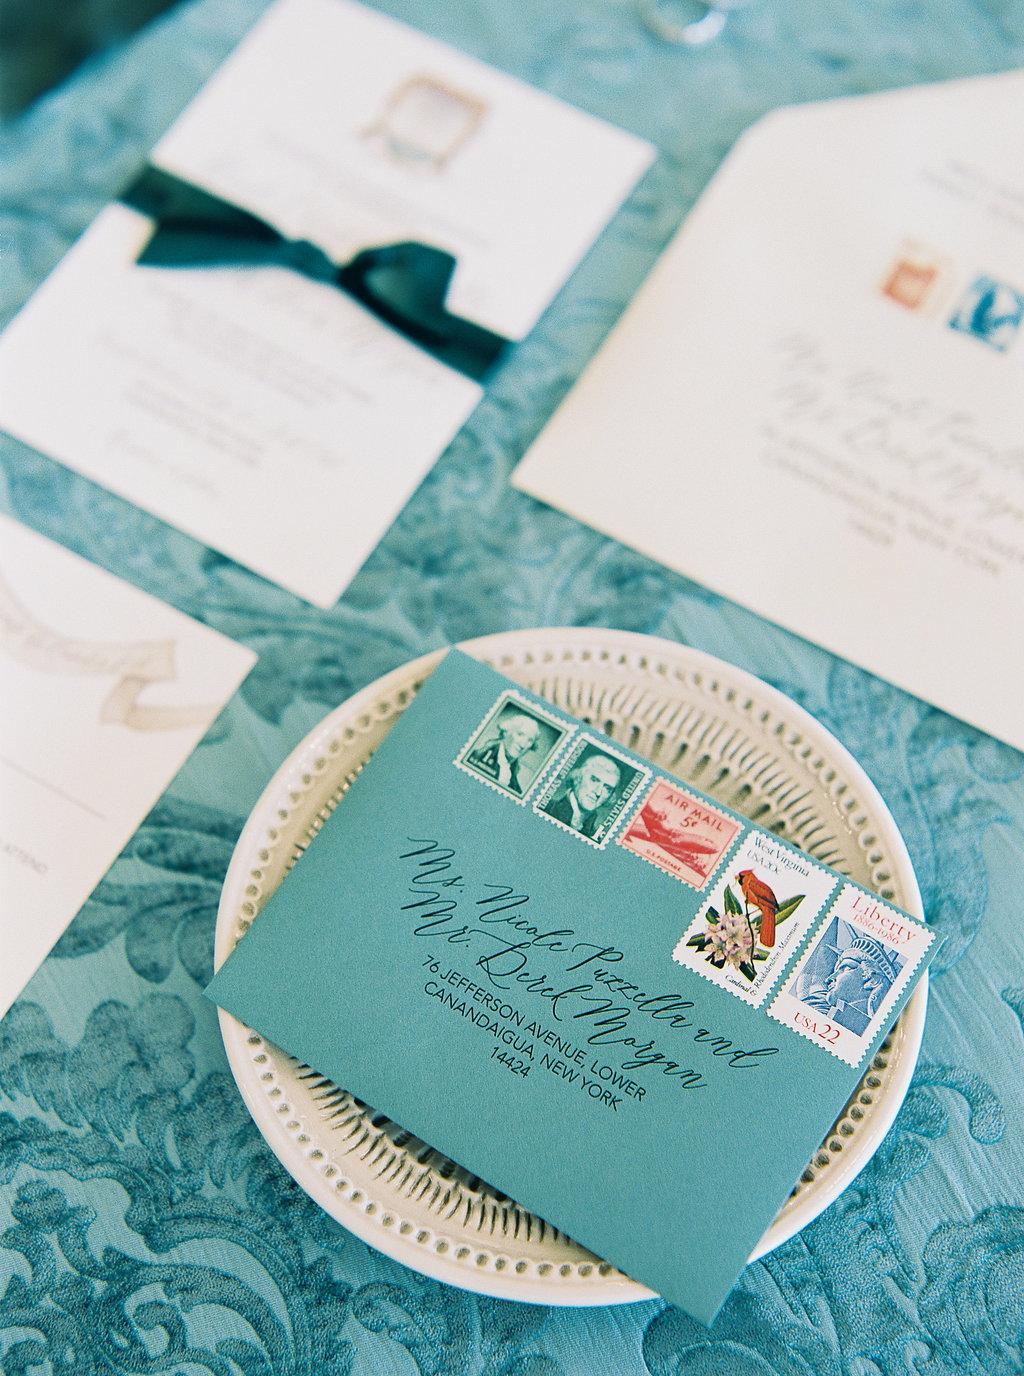 Alexandra-Elise-Photography-Ali-Reed-Nicole-Derek-Bristol-Harbour-Wedding-Reception-009.jpg